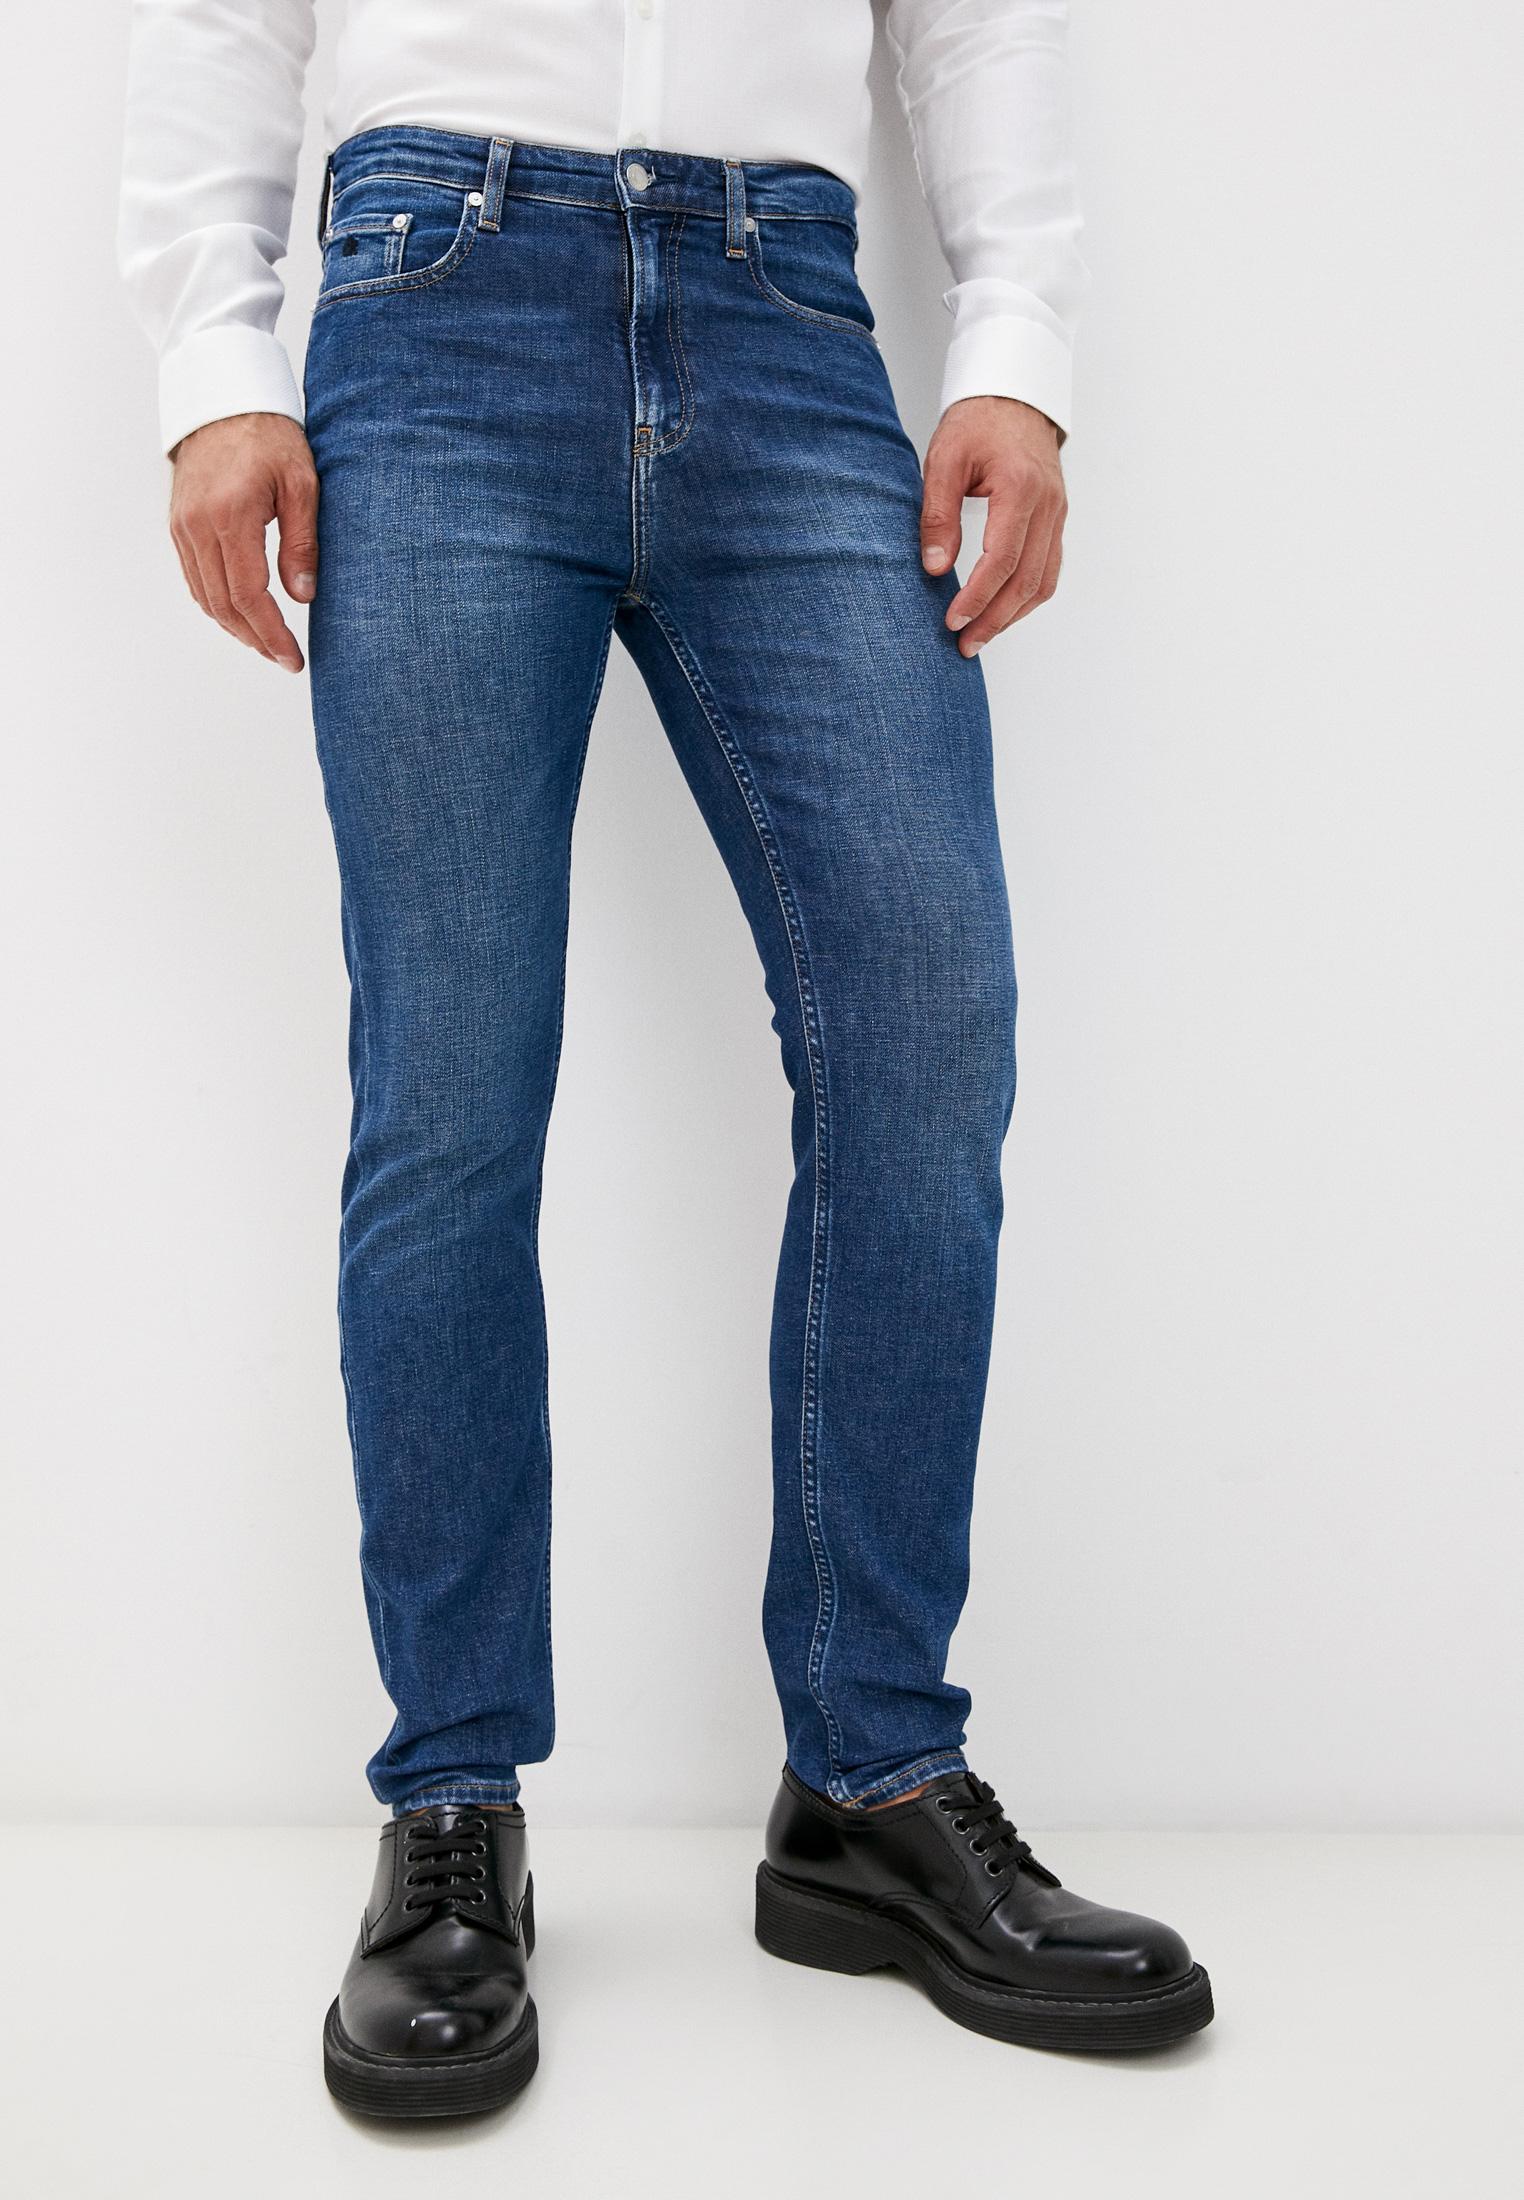 Зауженные джинсы Calvin Klein (Кельвин Кляйн) Джинсы Calvin Klein